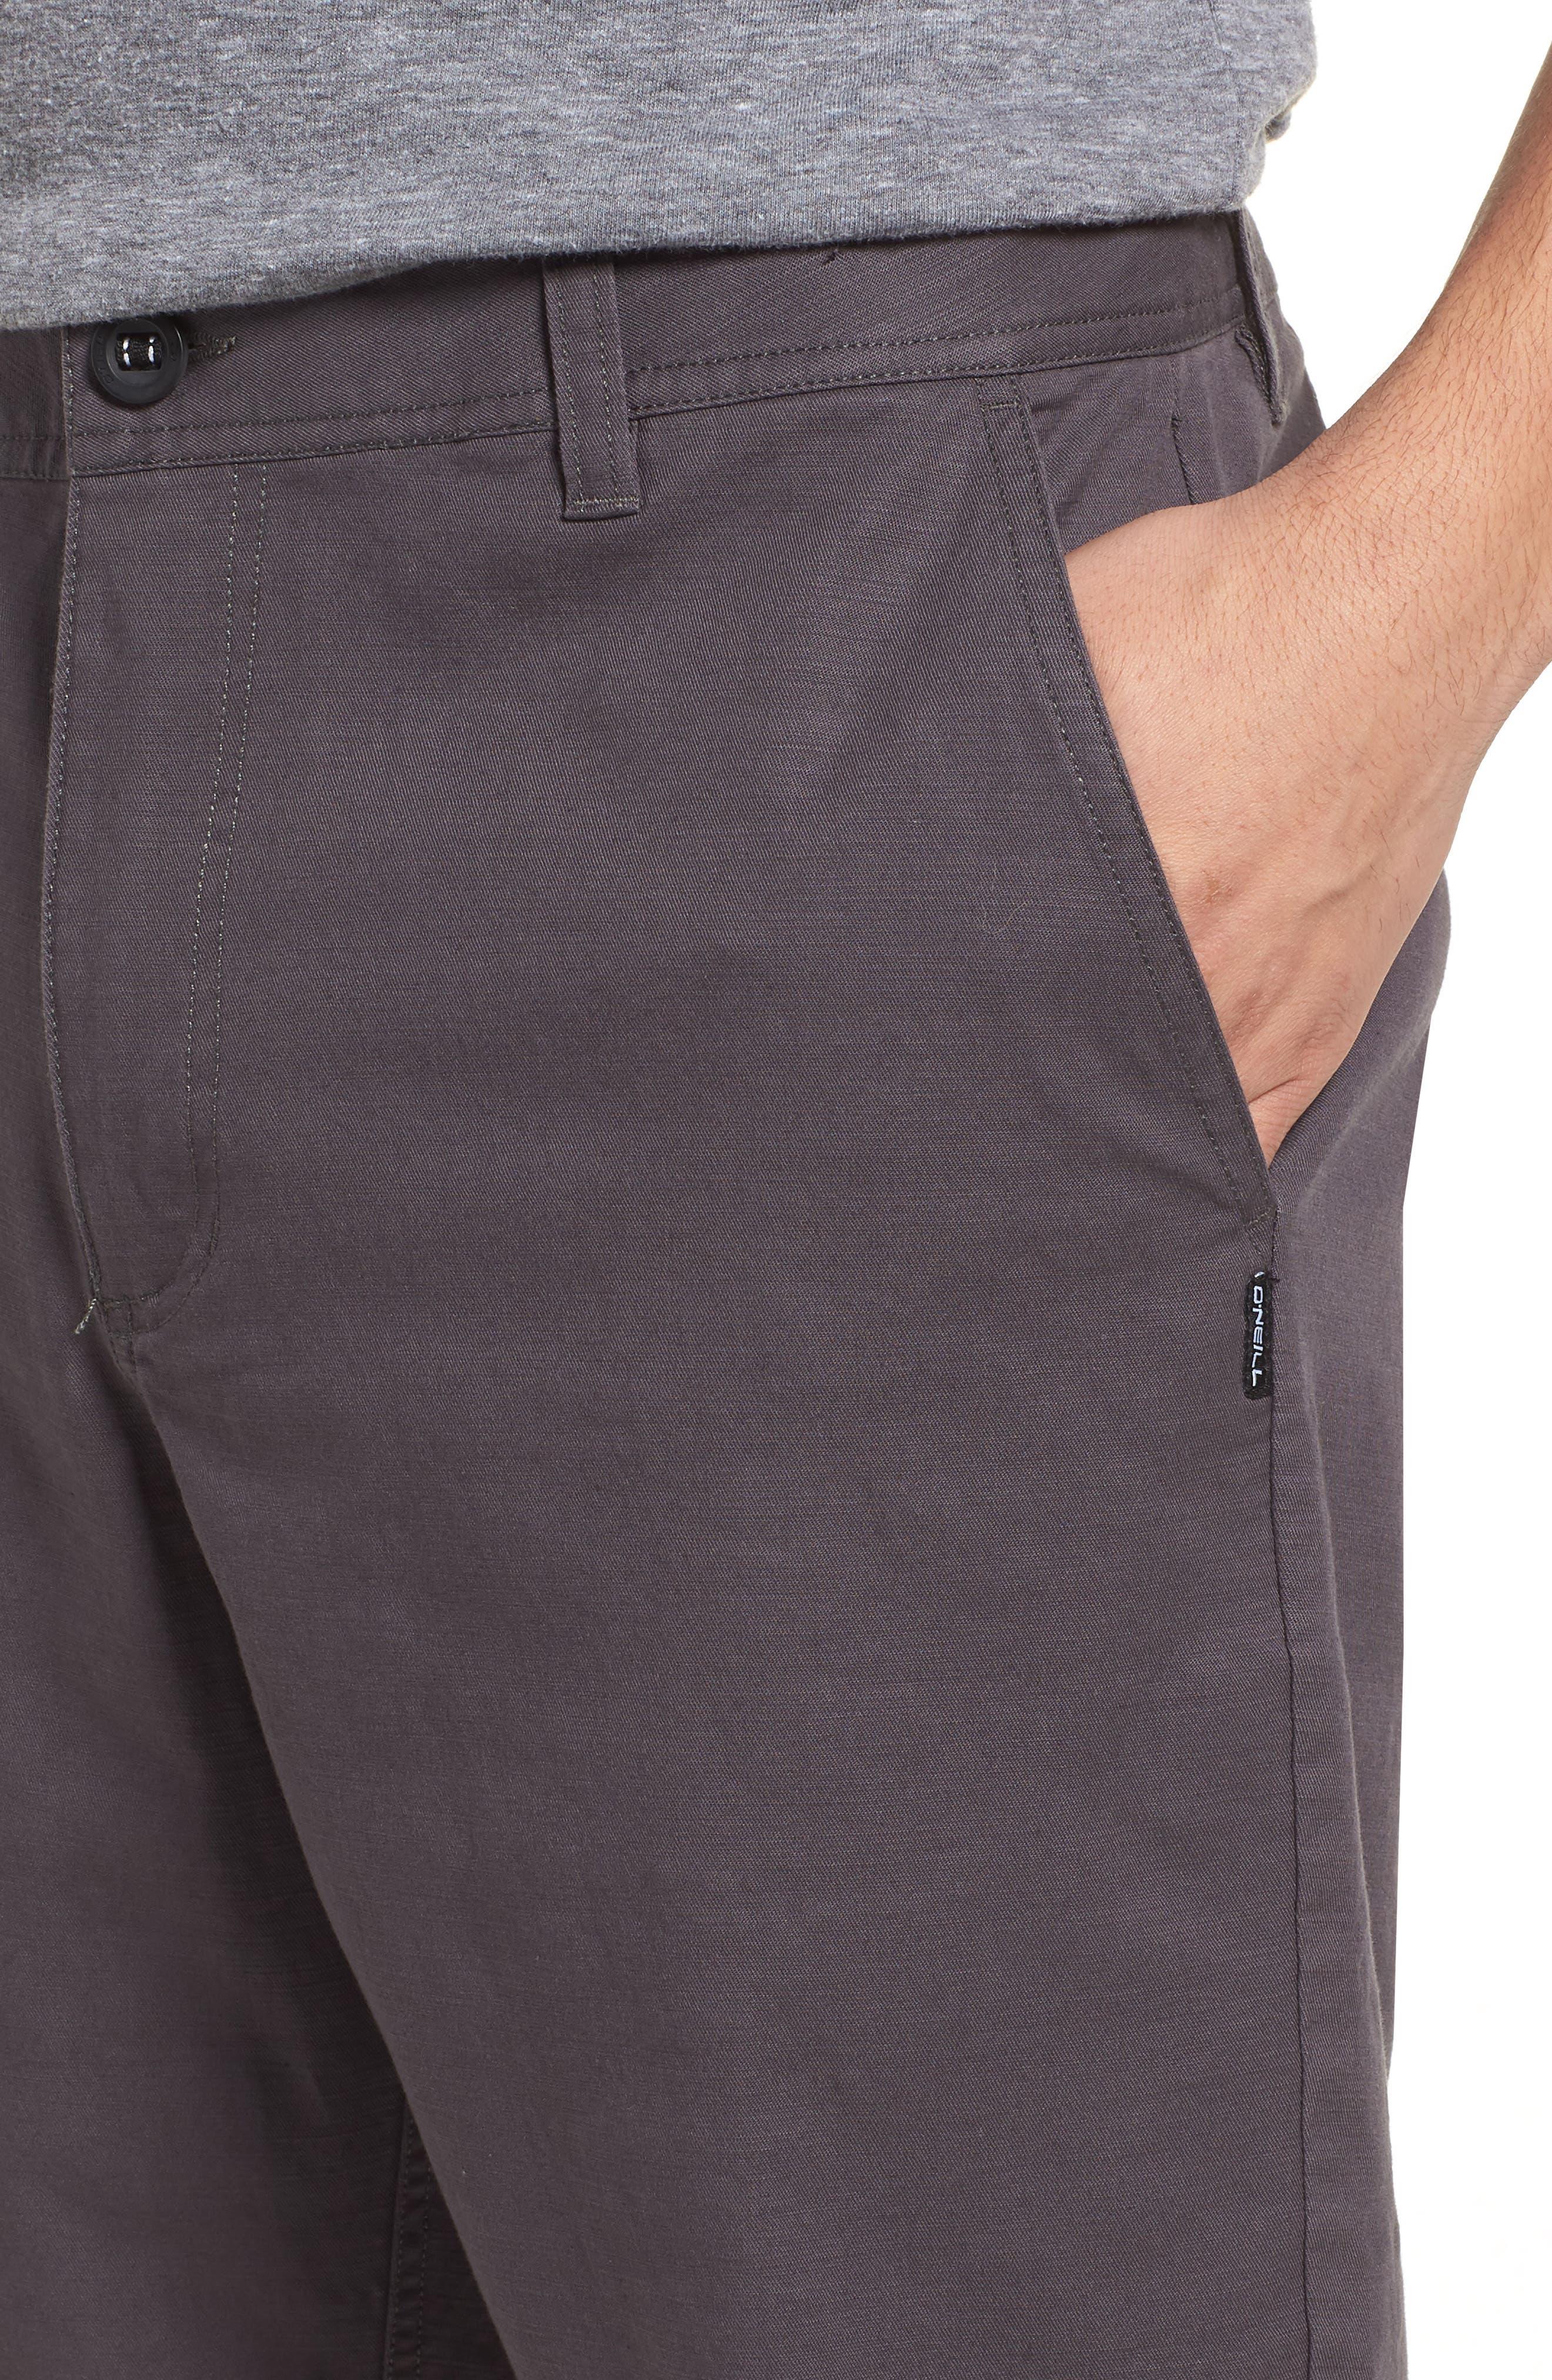 Jay Stretch Chino Shorts,                             Alternate thumbnail 18, color,